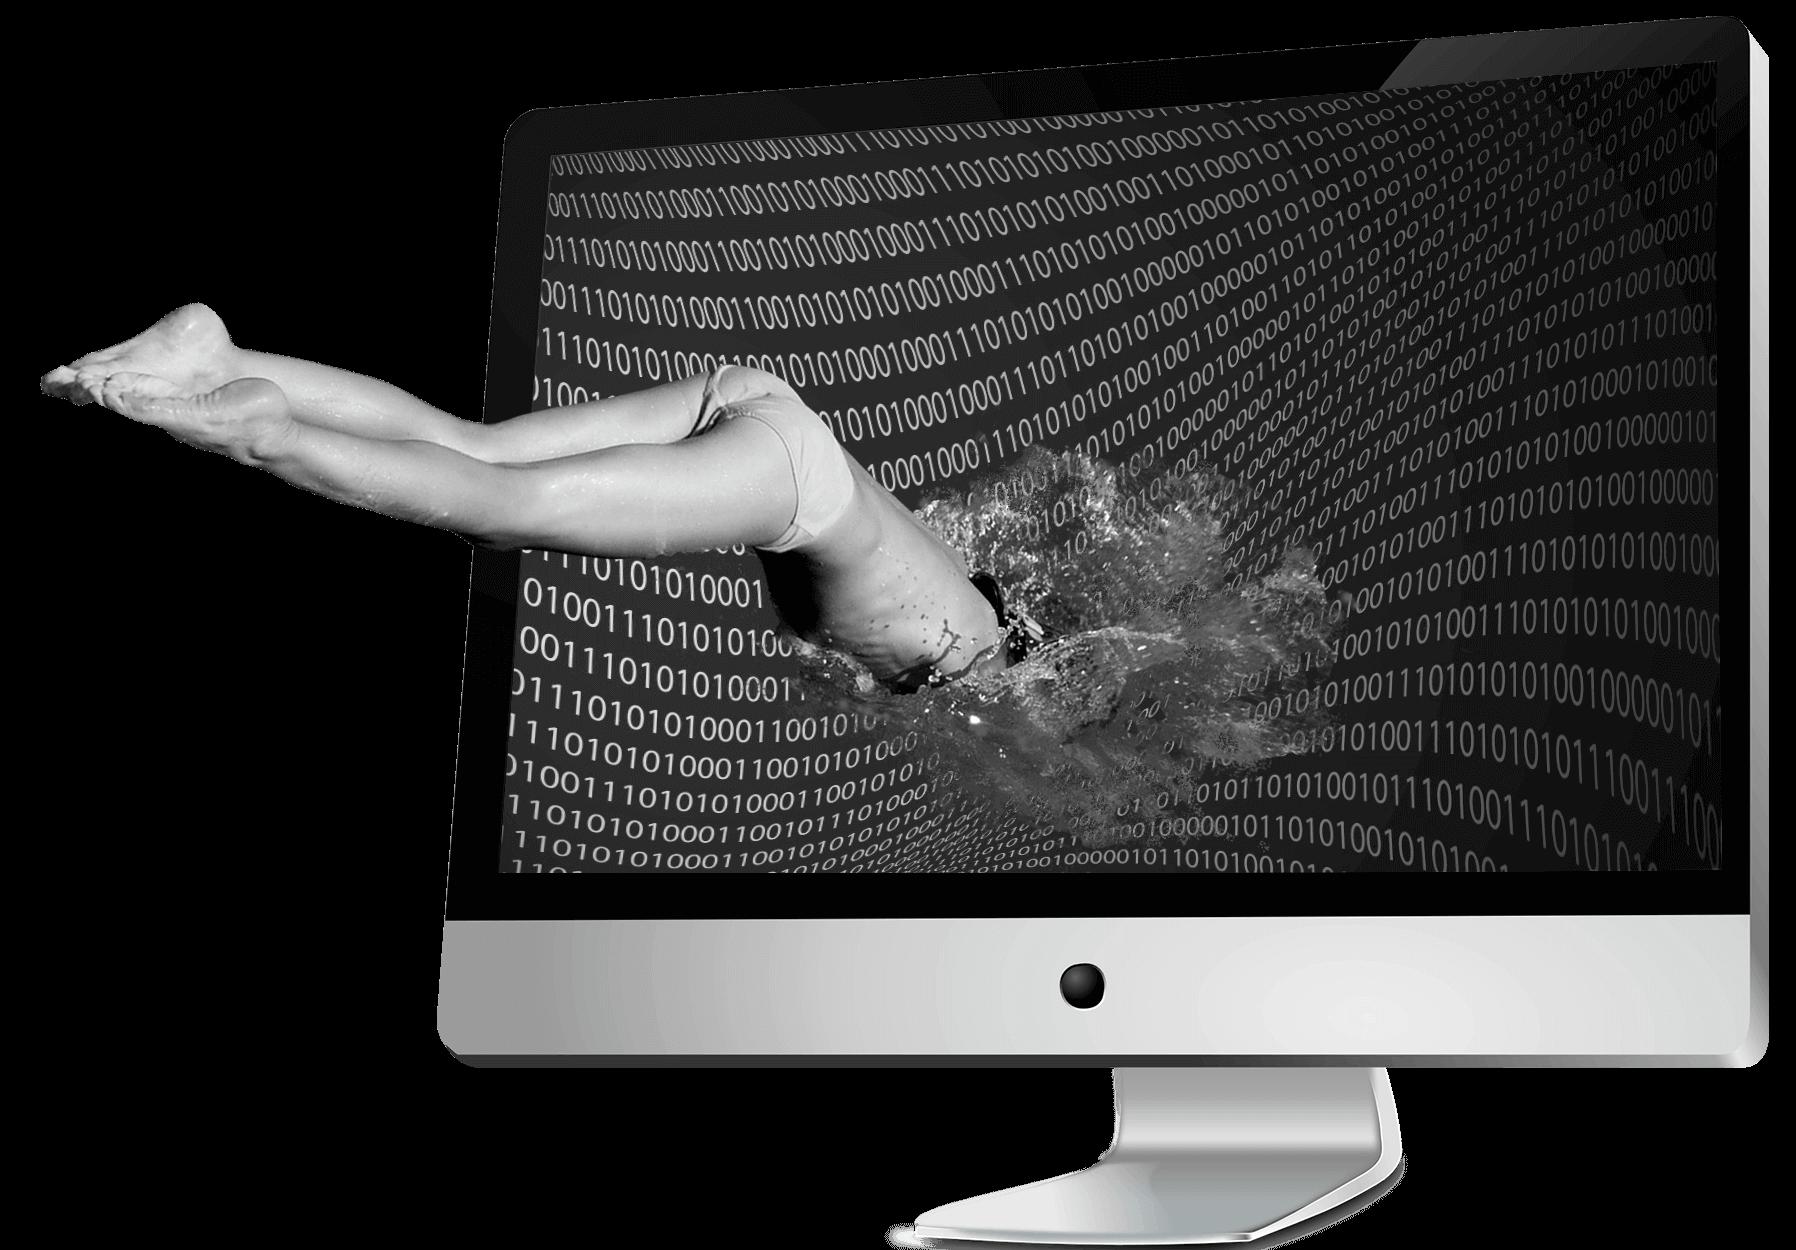 plongeon dans le web